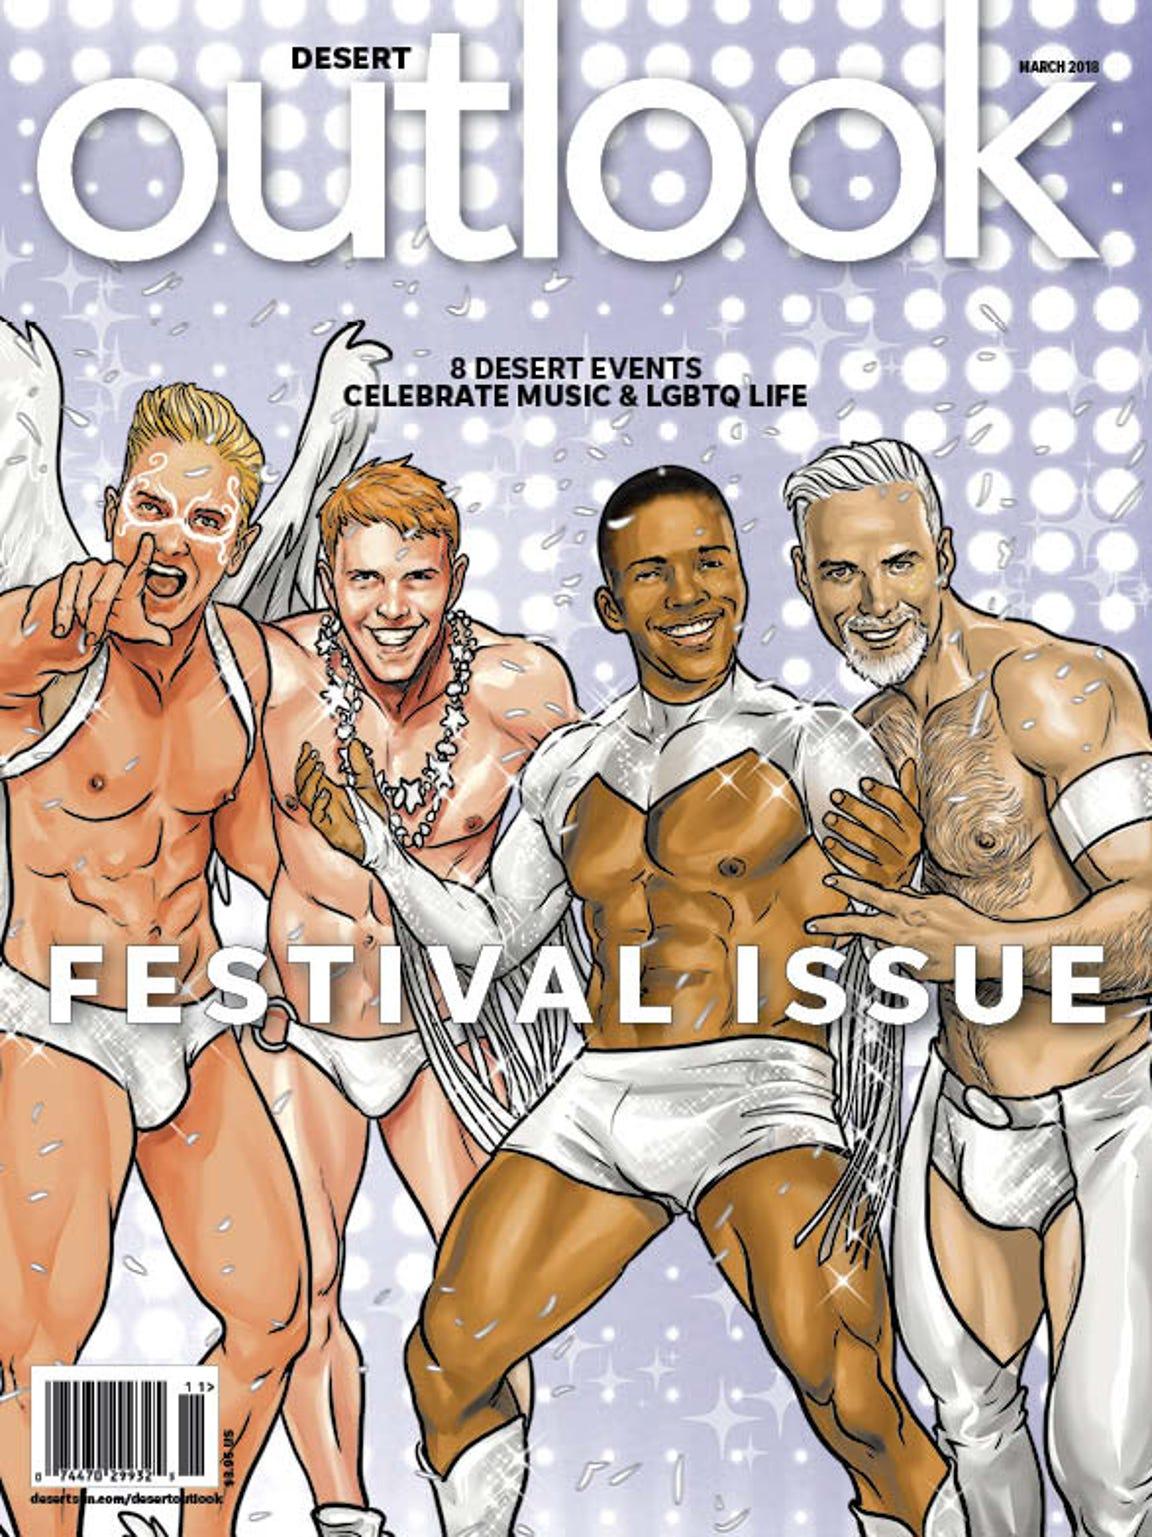 Desert Outlook's March 2018 Festival Issue. Cover image